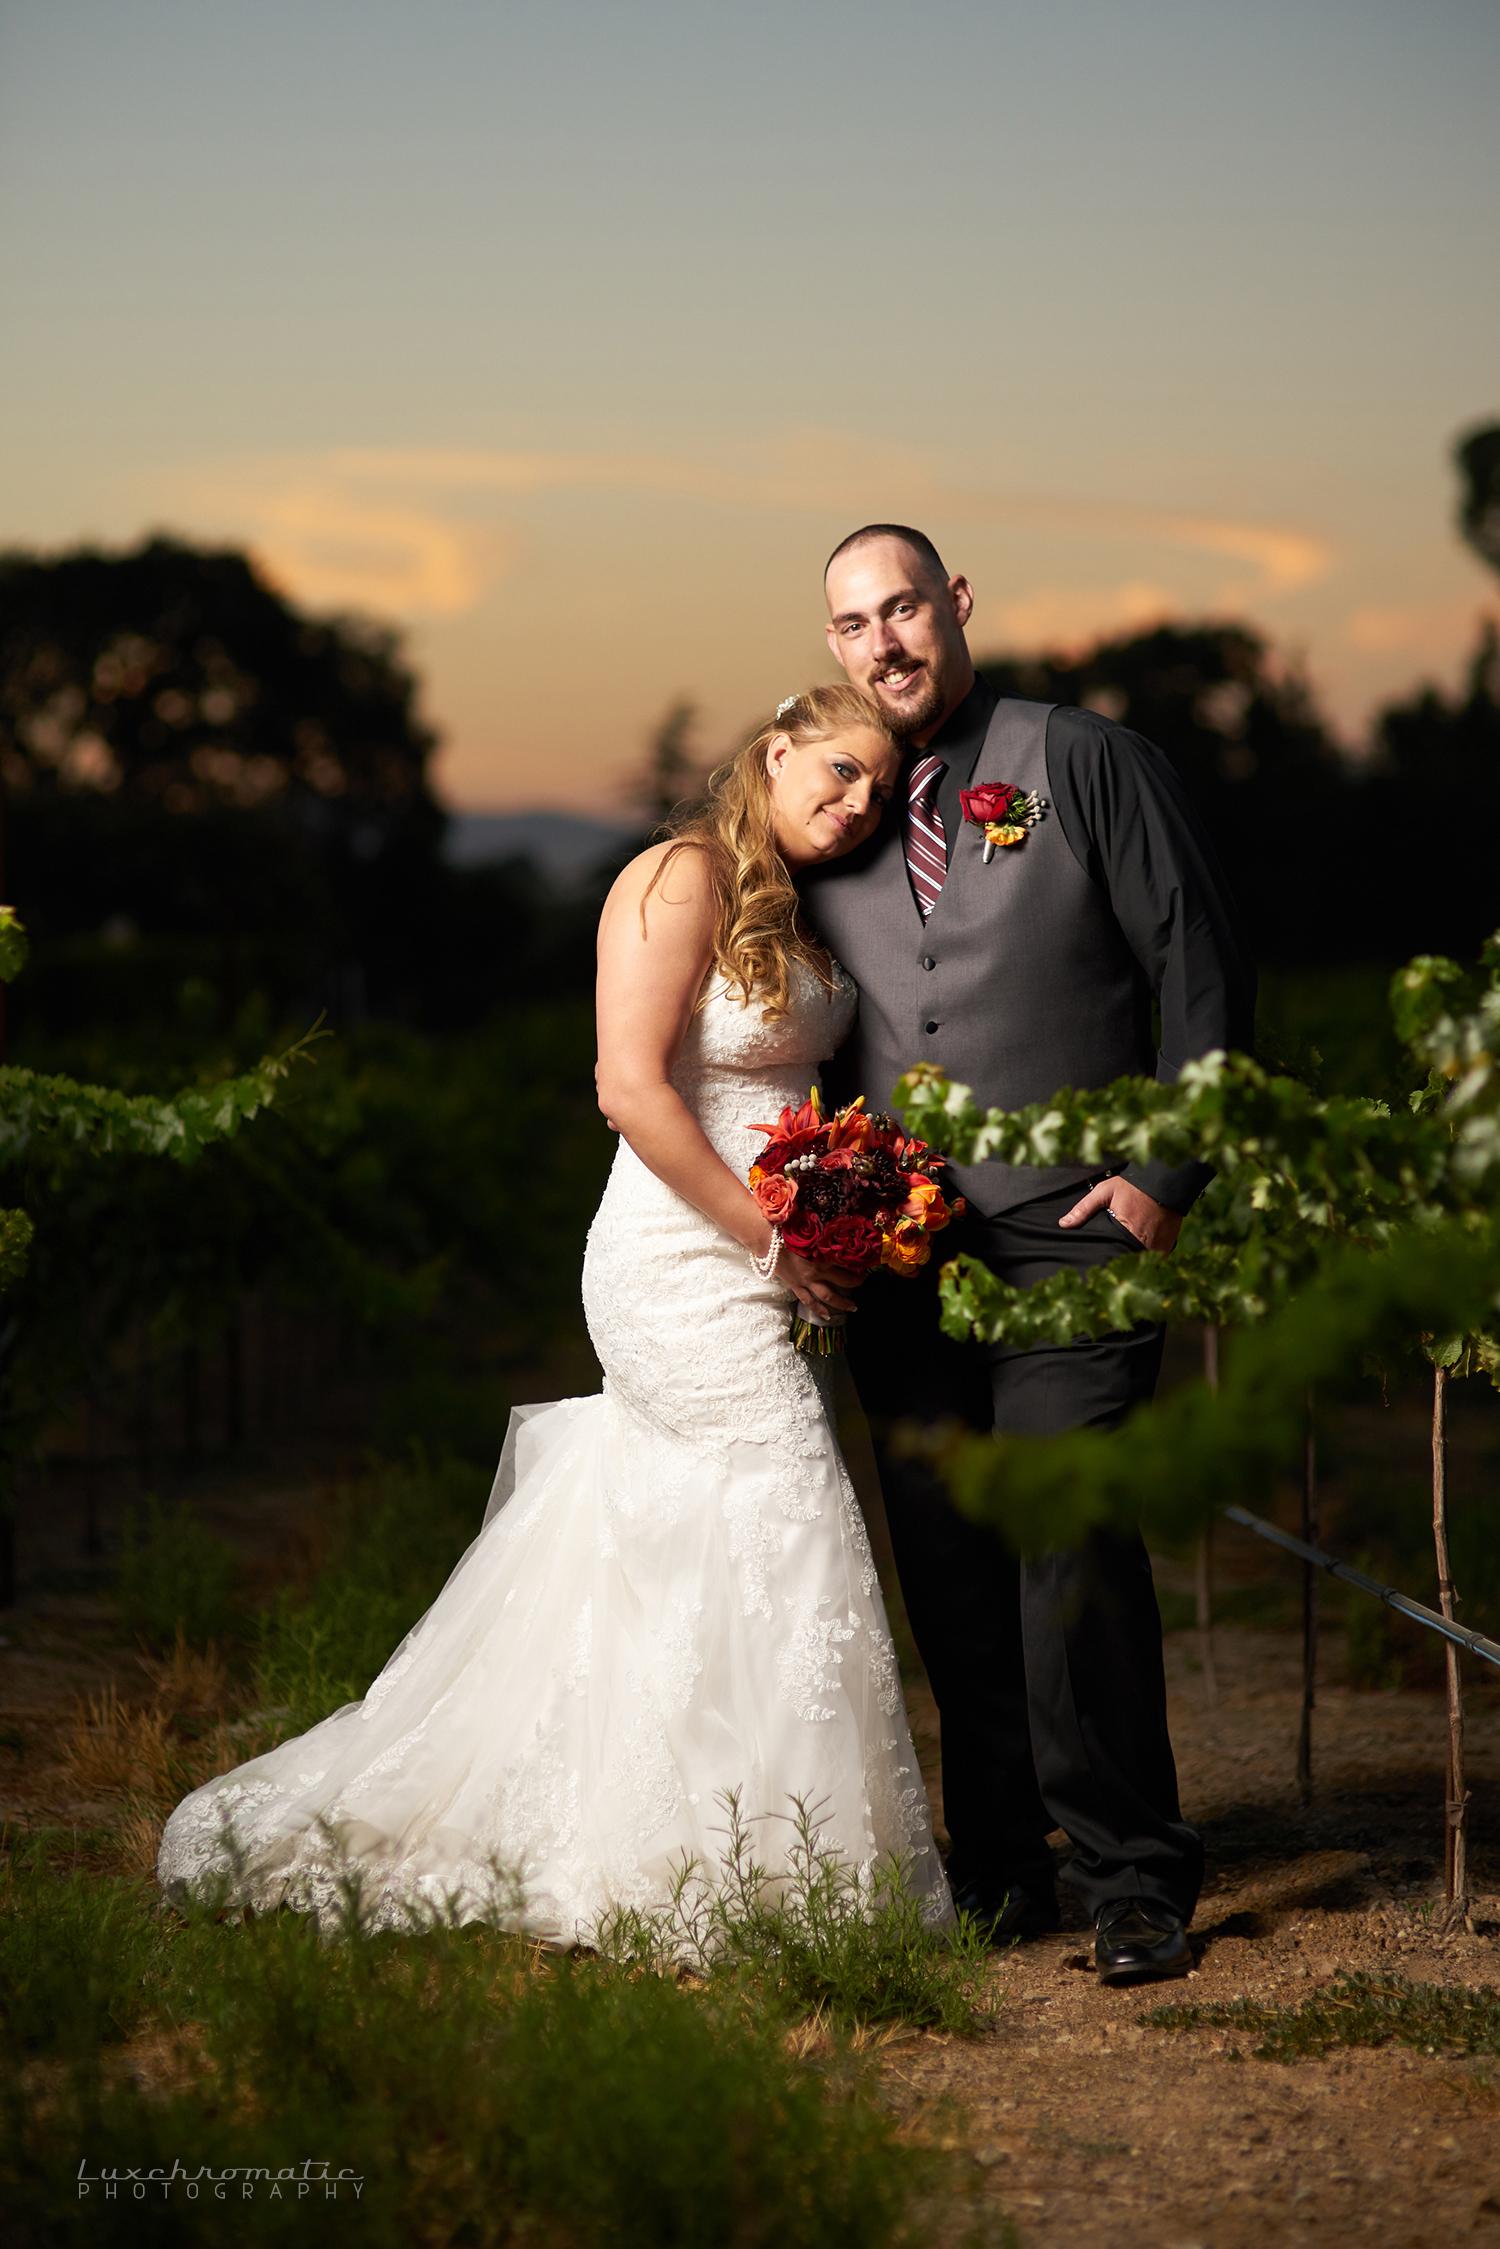 081217_Rachel_Chris_a0703-weddingdress-bride-weddingphotography-weddingphotographer-bridal-groom-wedding-engagementring-proposal-brides-diamondring-sonyalpha-sony-sonya9-sonya7rii-sanfrancisco-sf-bayarea-photographer-profoto-murrietas-well.jpg